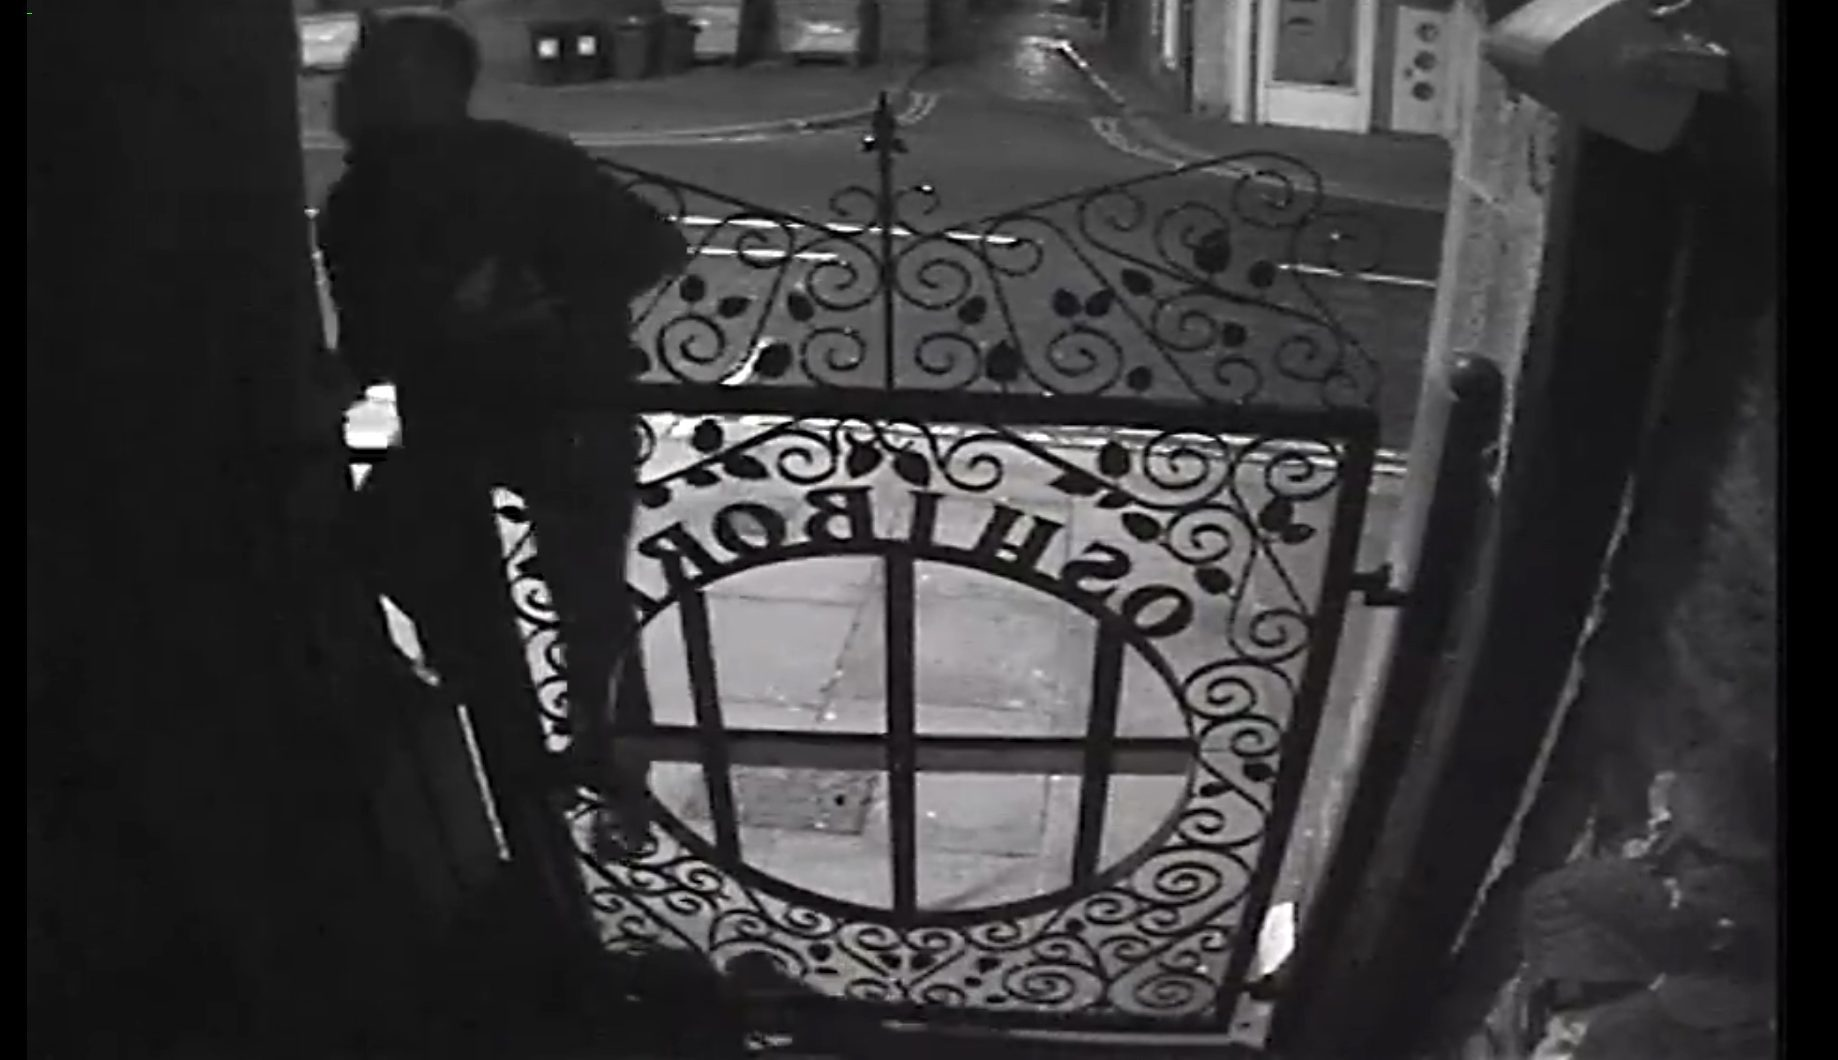 A recent break-in attempt caught on CCTV.